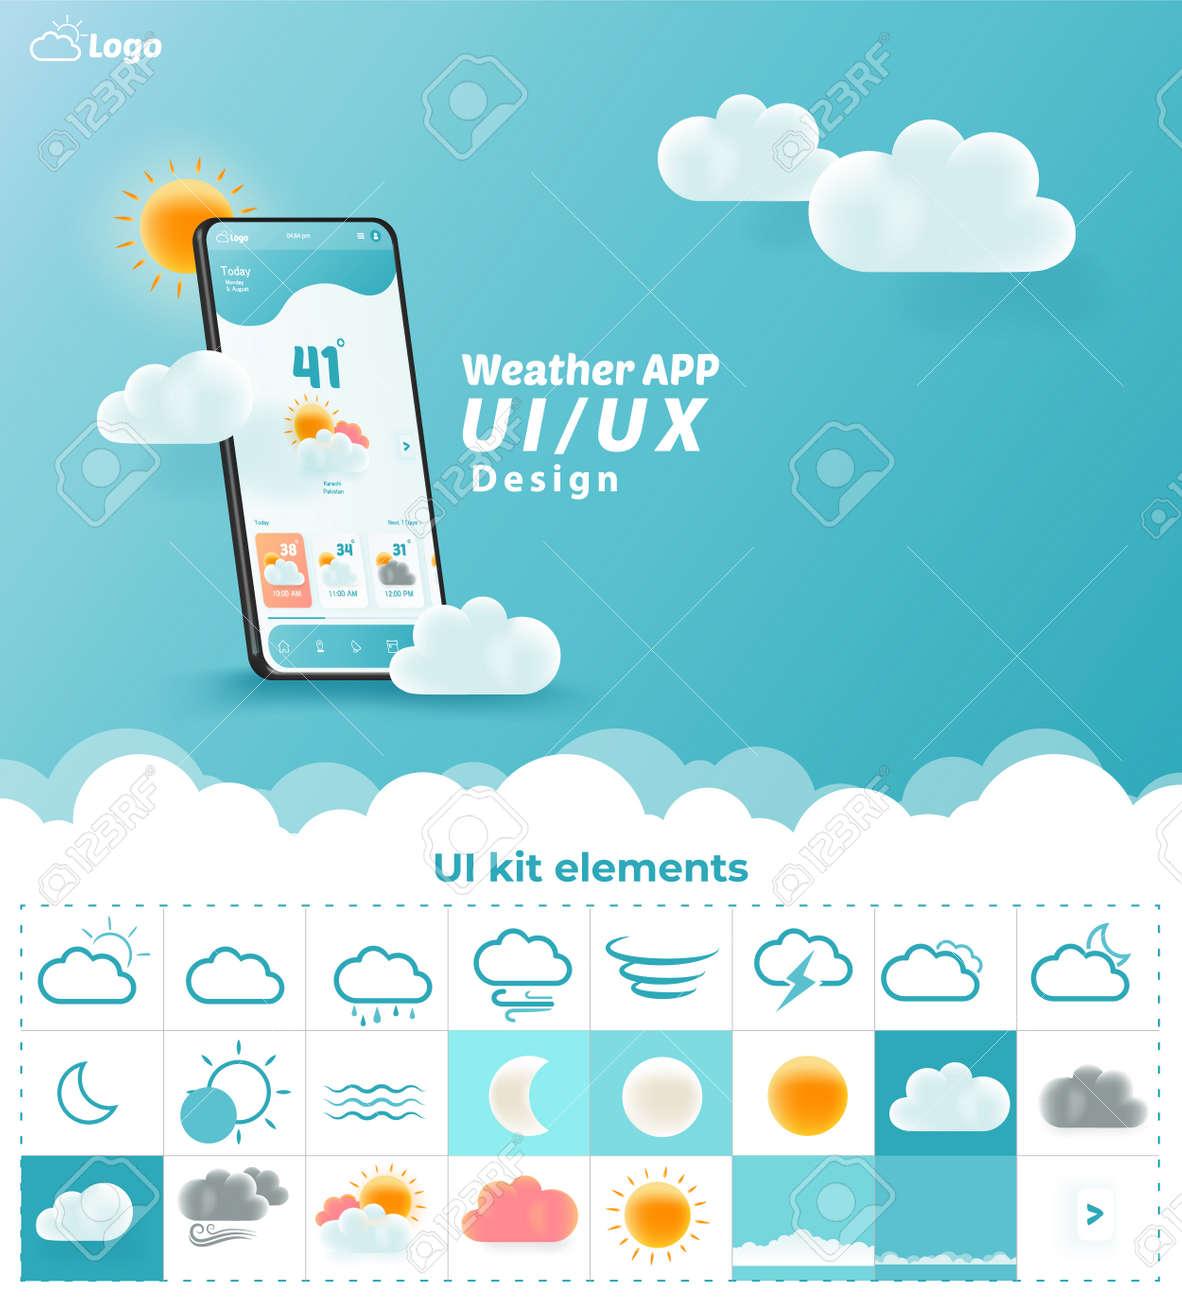 Weather App UI/UX Kit Elements, Website Landing Page Vector - 157651895